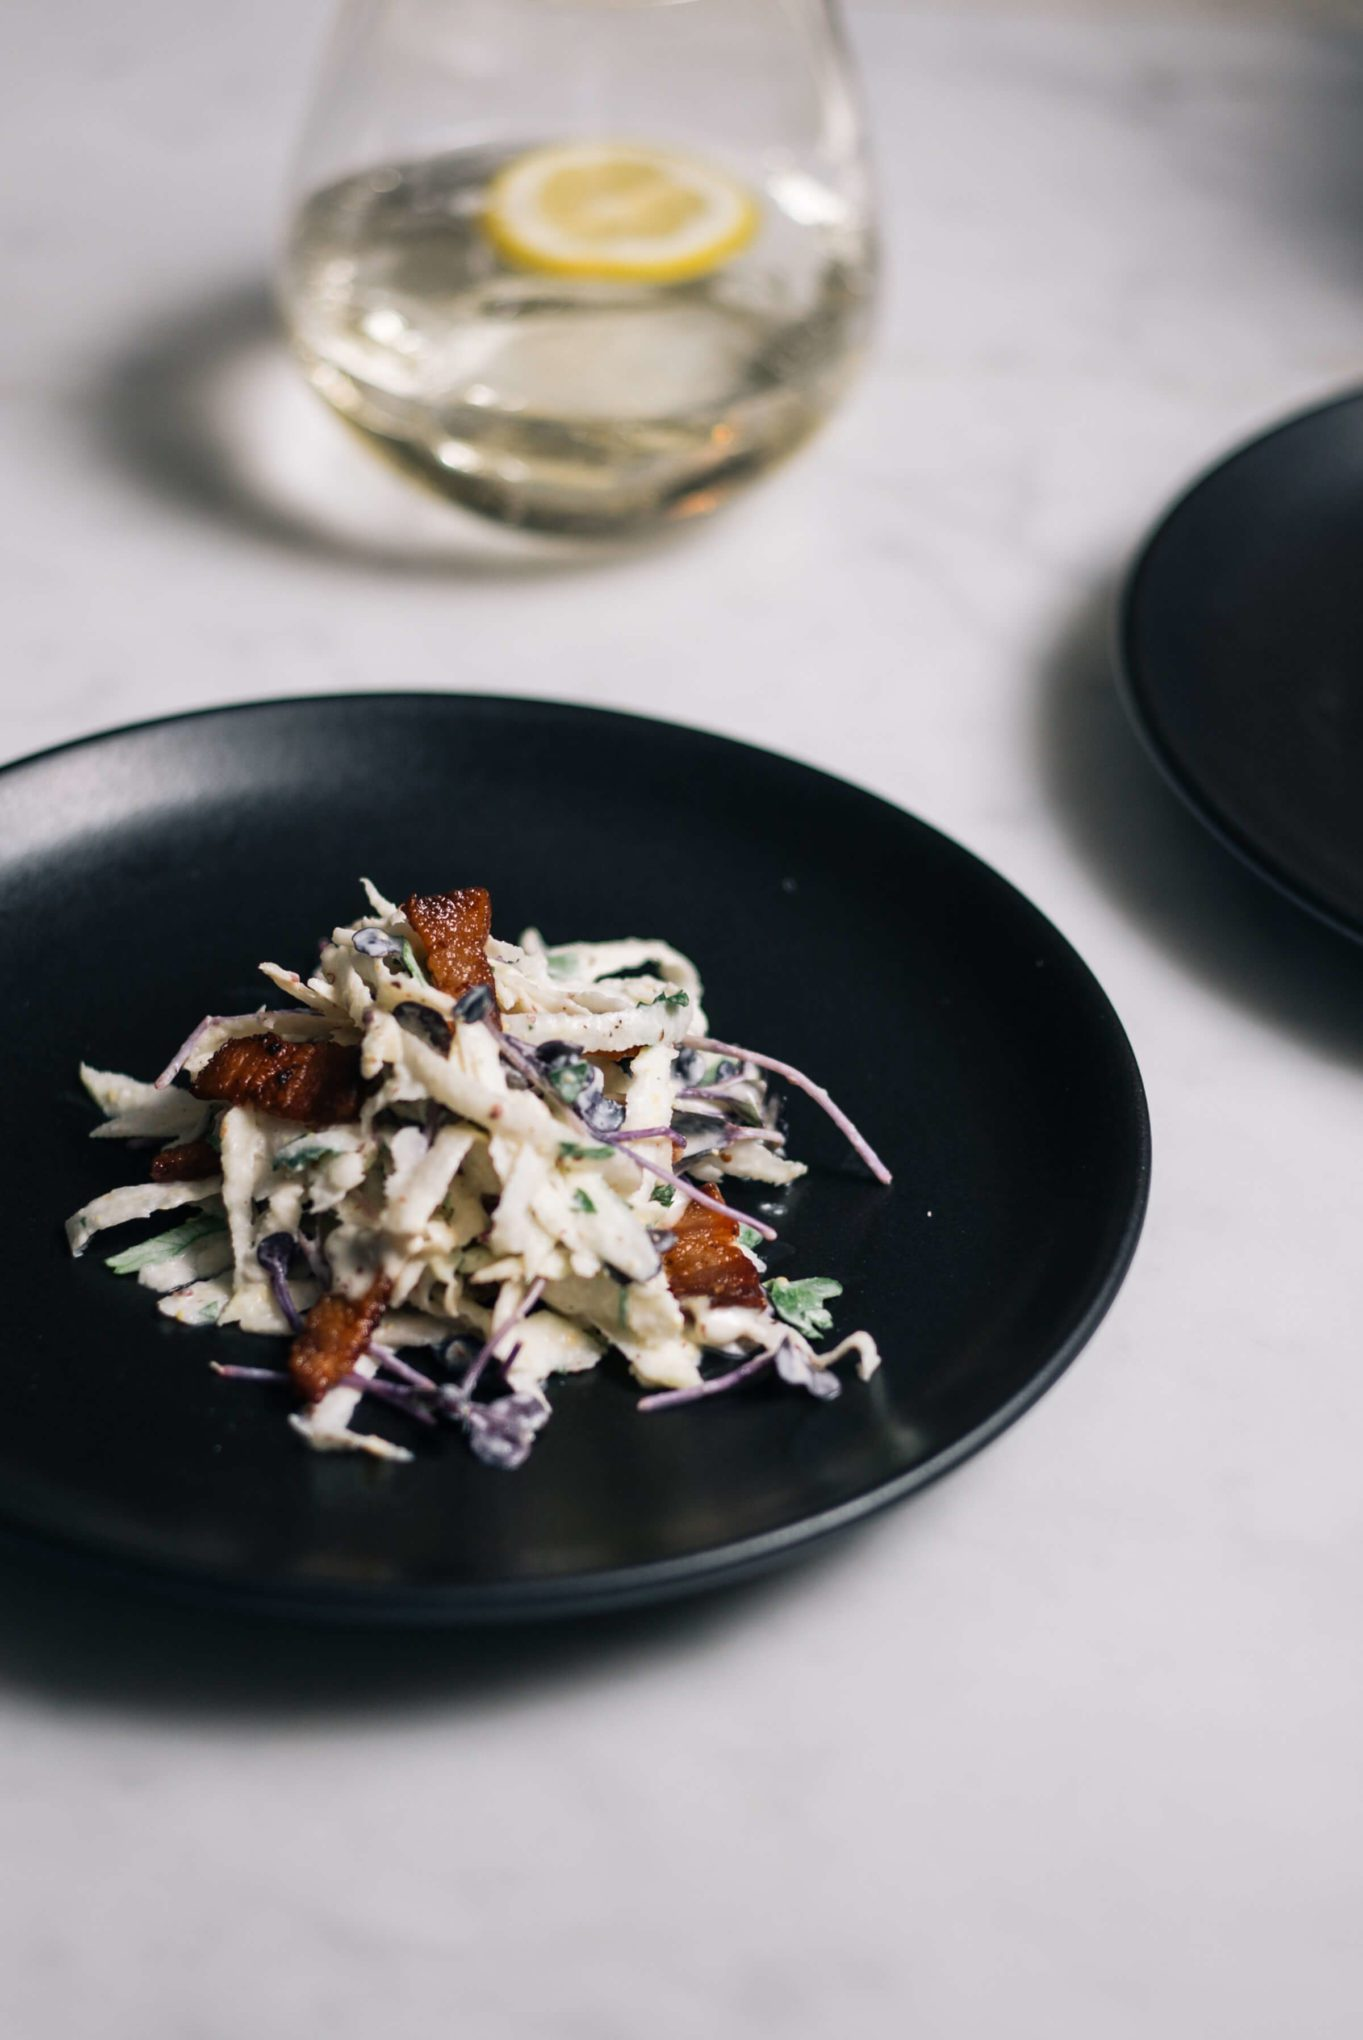 Celeriac and Bacon Salad made by the taste sf